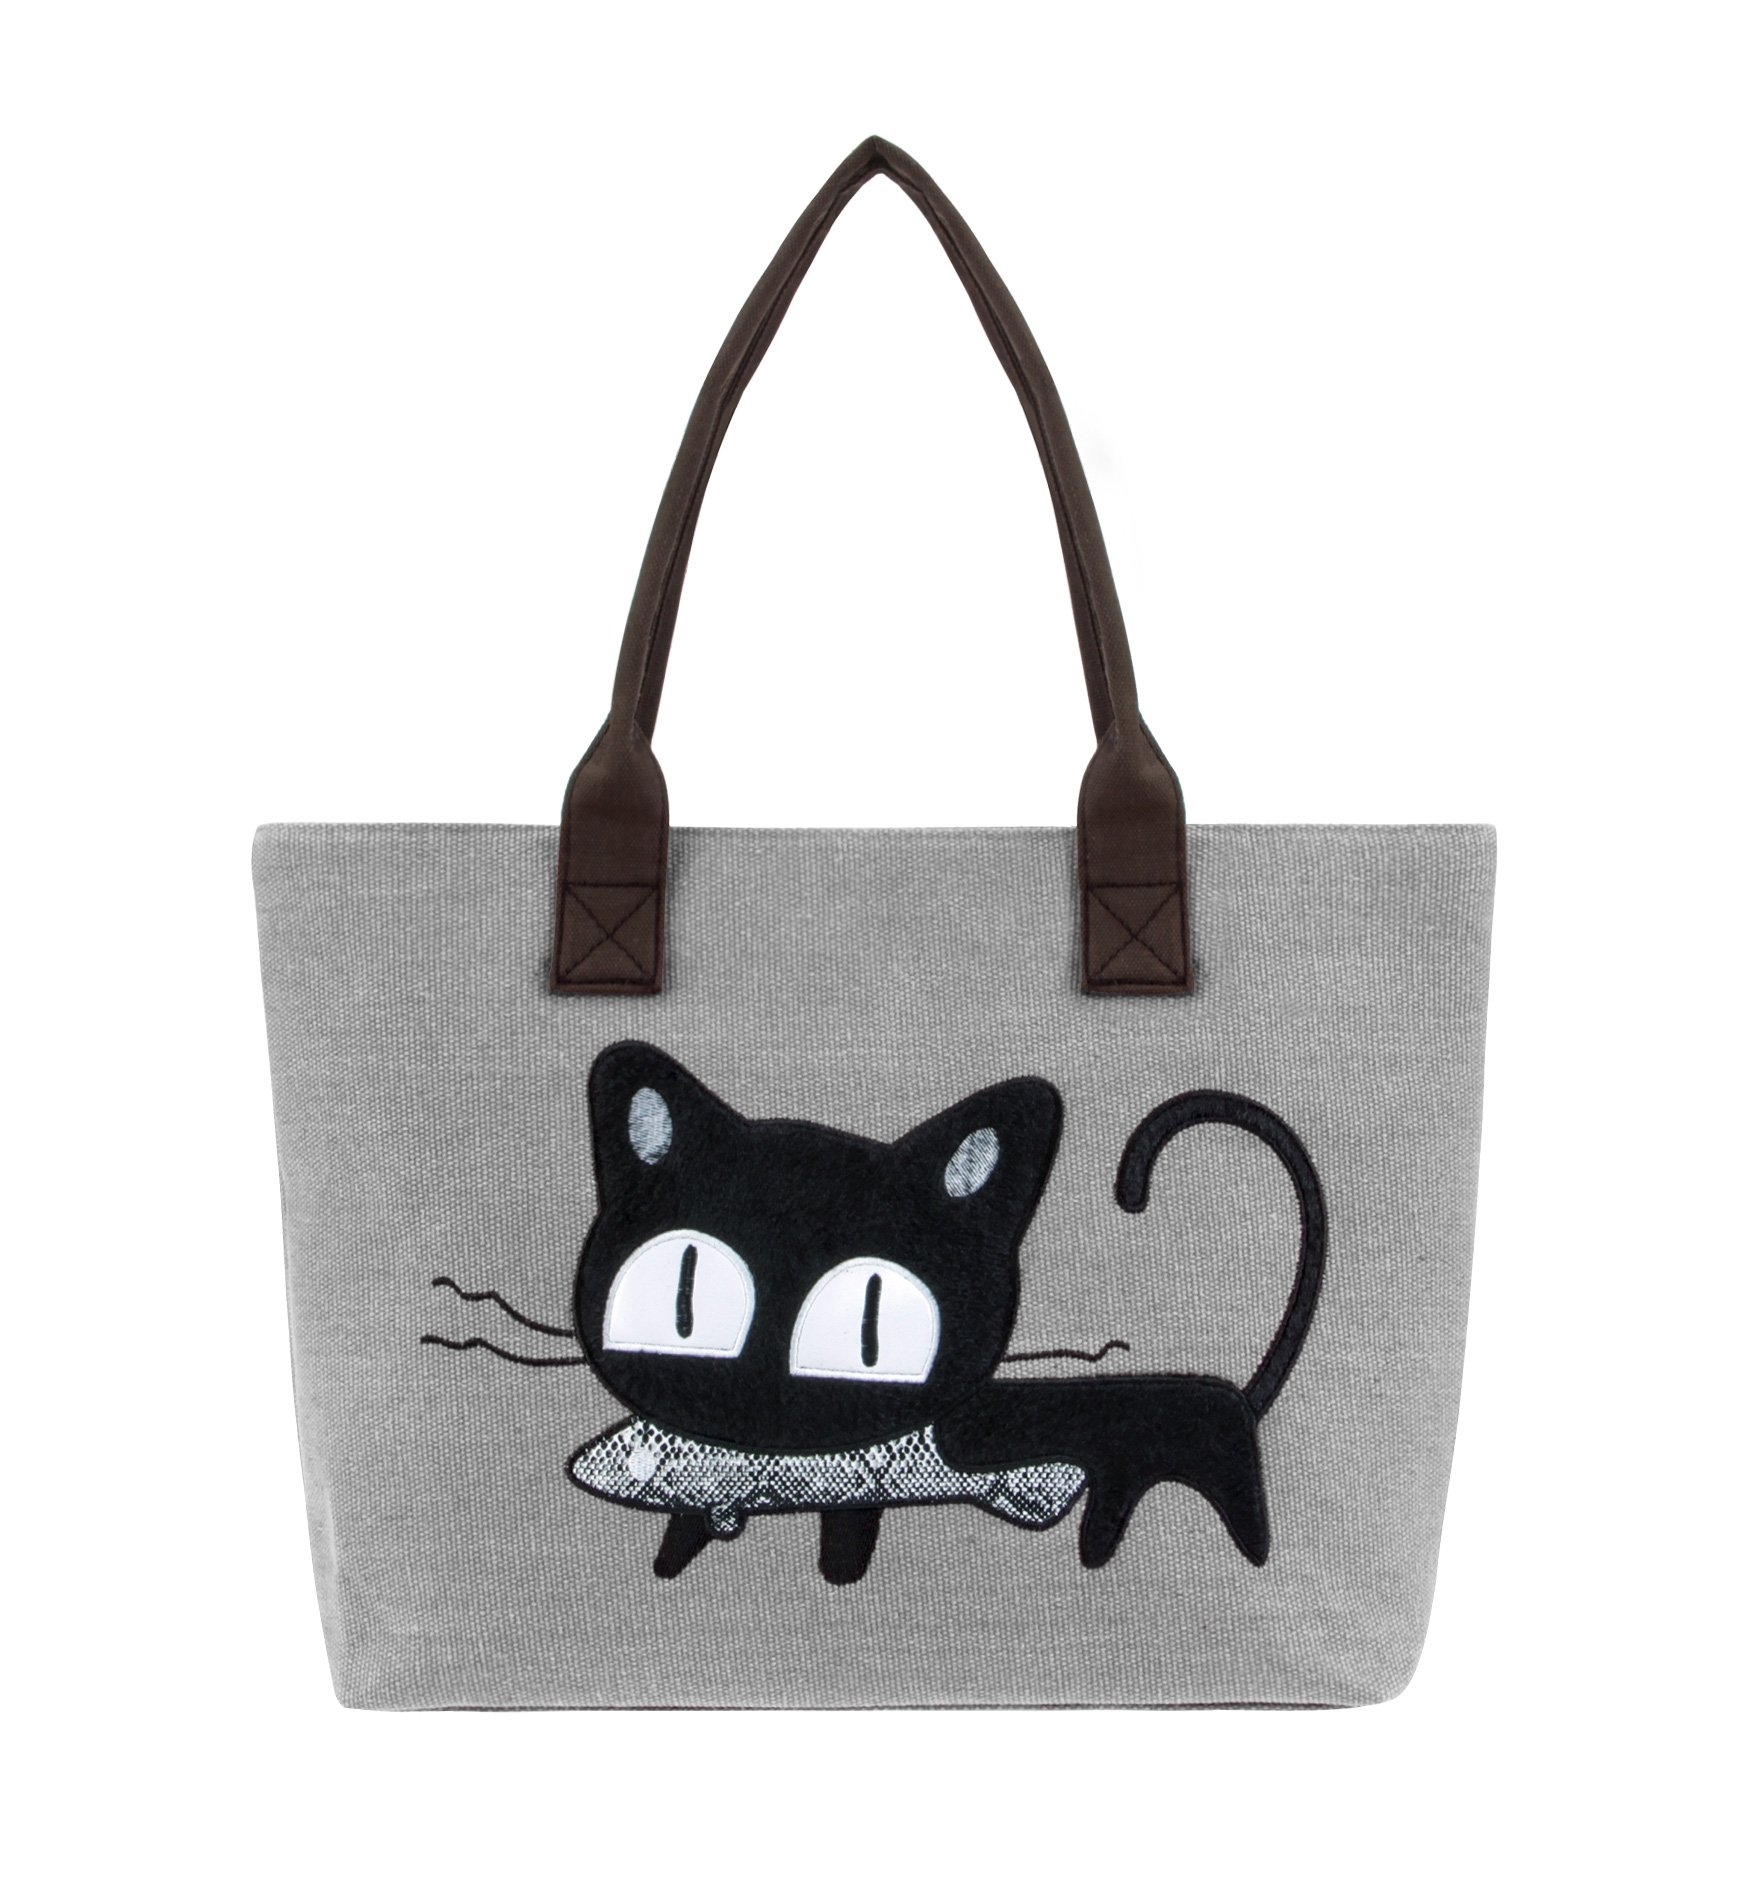 Tom Clovers Cat Animal Tote Bag Large Utility Canvas Shoulder Purse Top Handle Handbag Beach Satchel Bag Women Girl with Zipper Grey